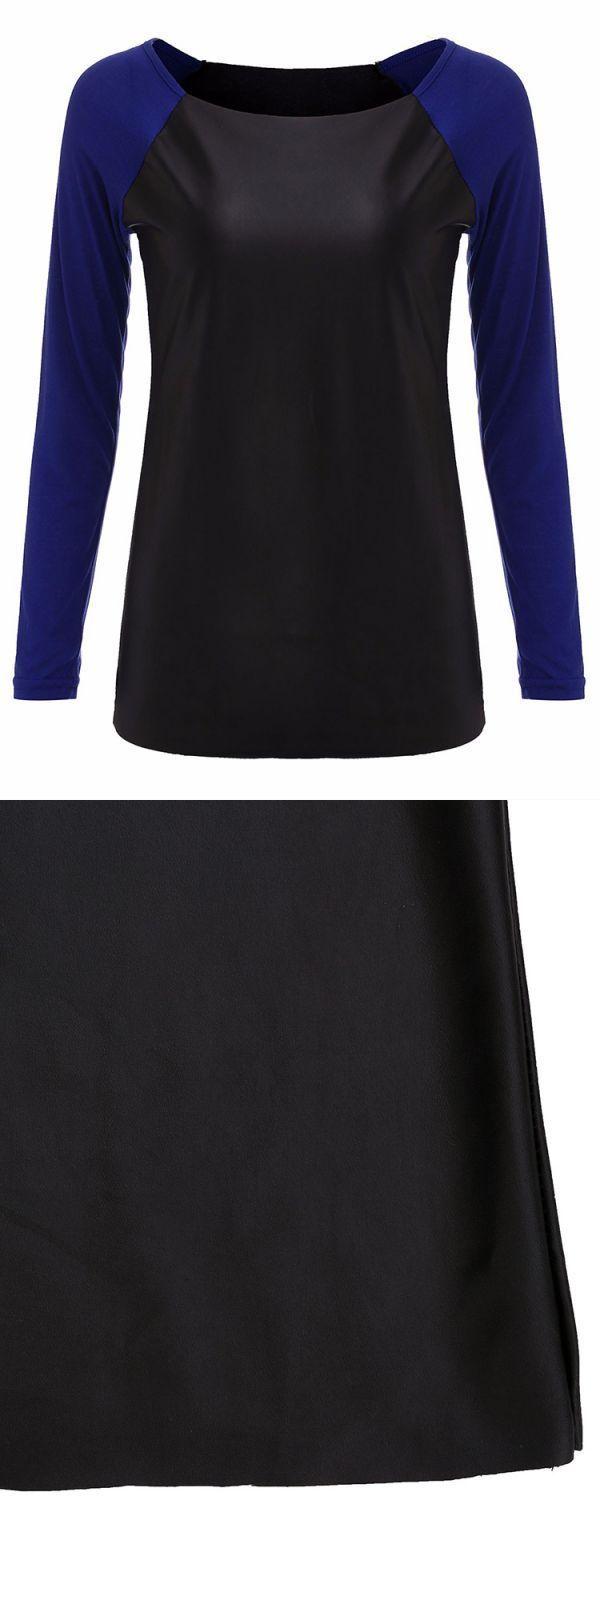 Womens Black Dress Shirt Walmart